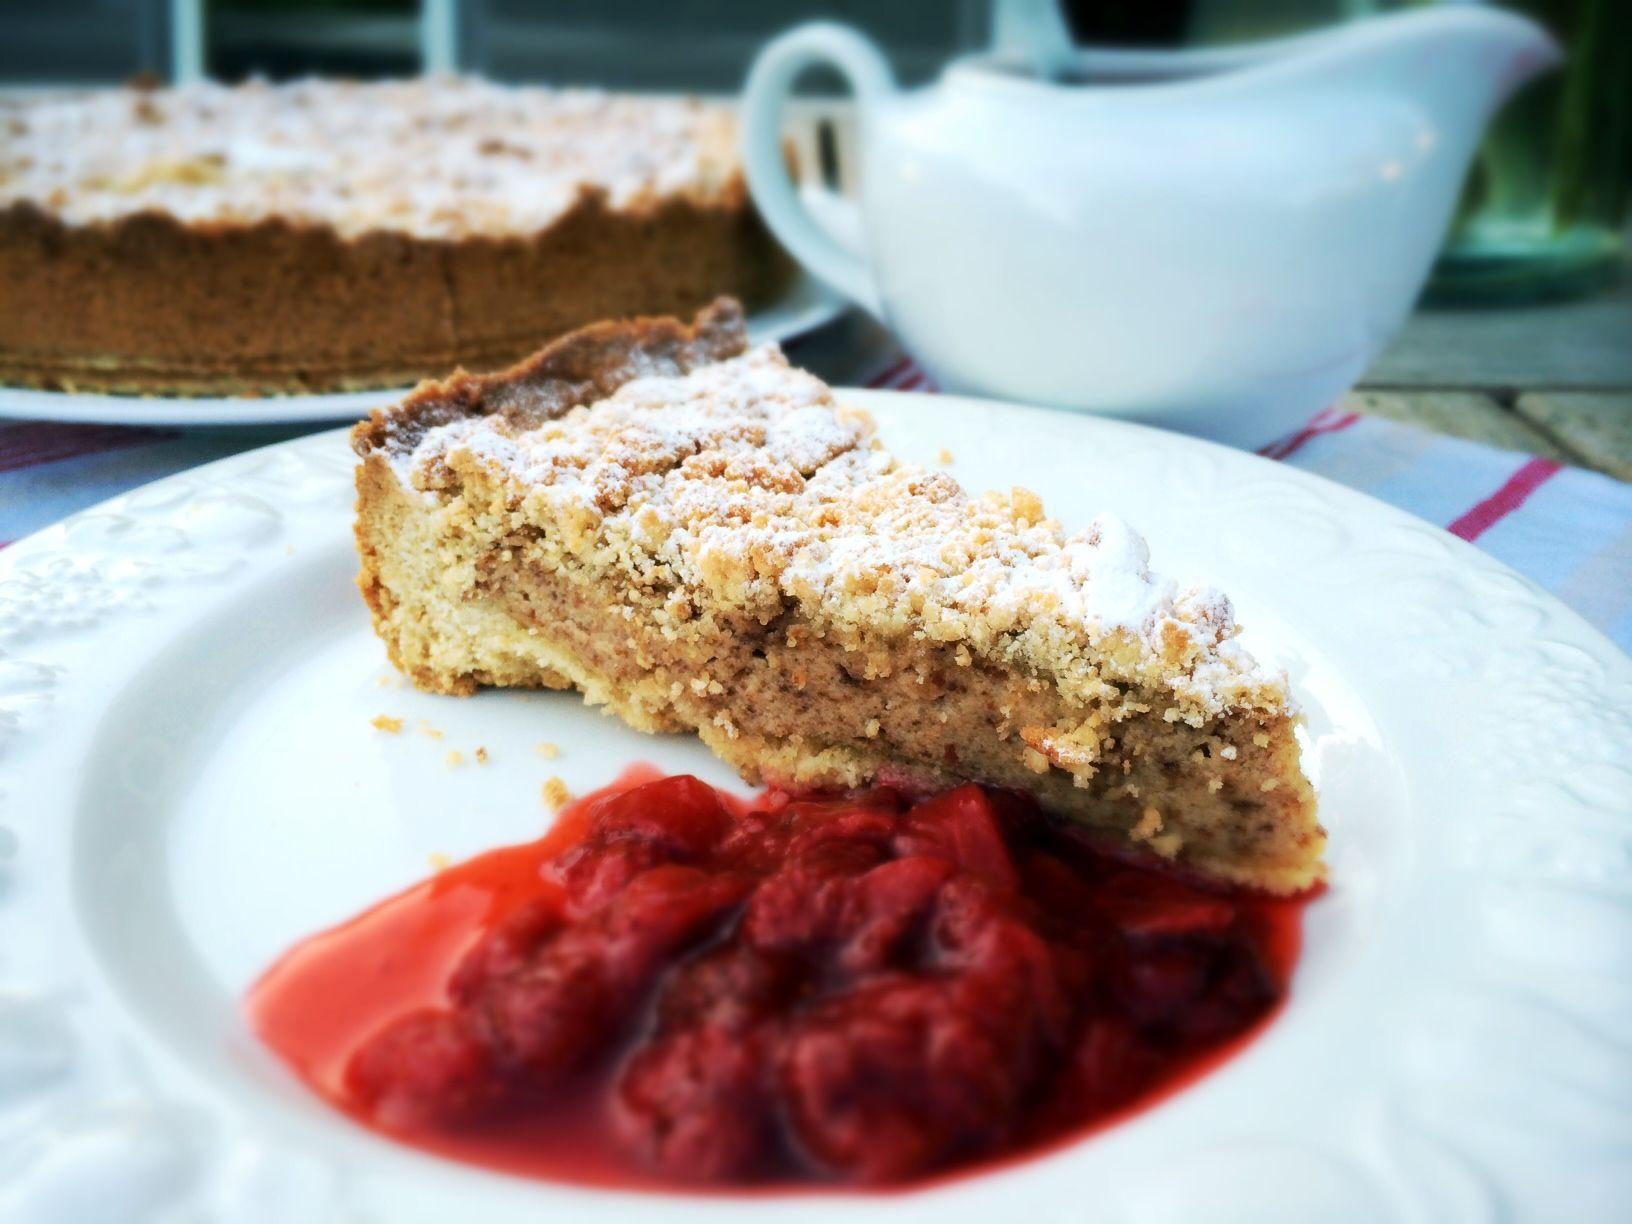 #Ricotta and #Amaretti tarte with a fresh summery #strawberry sauce